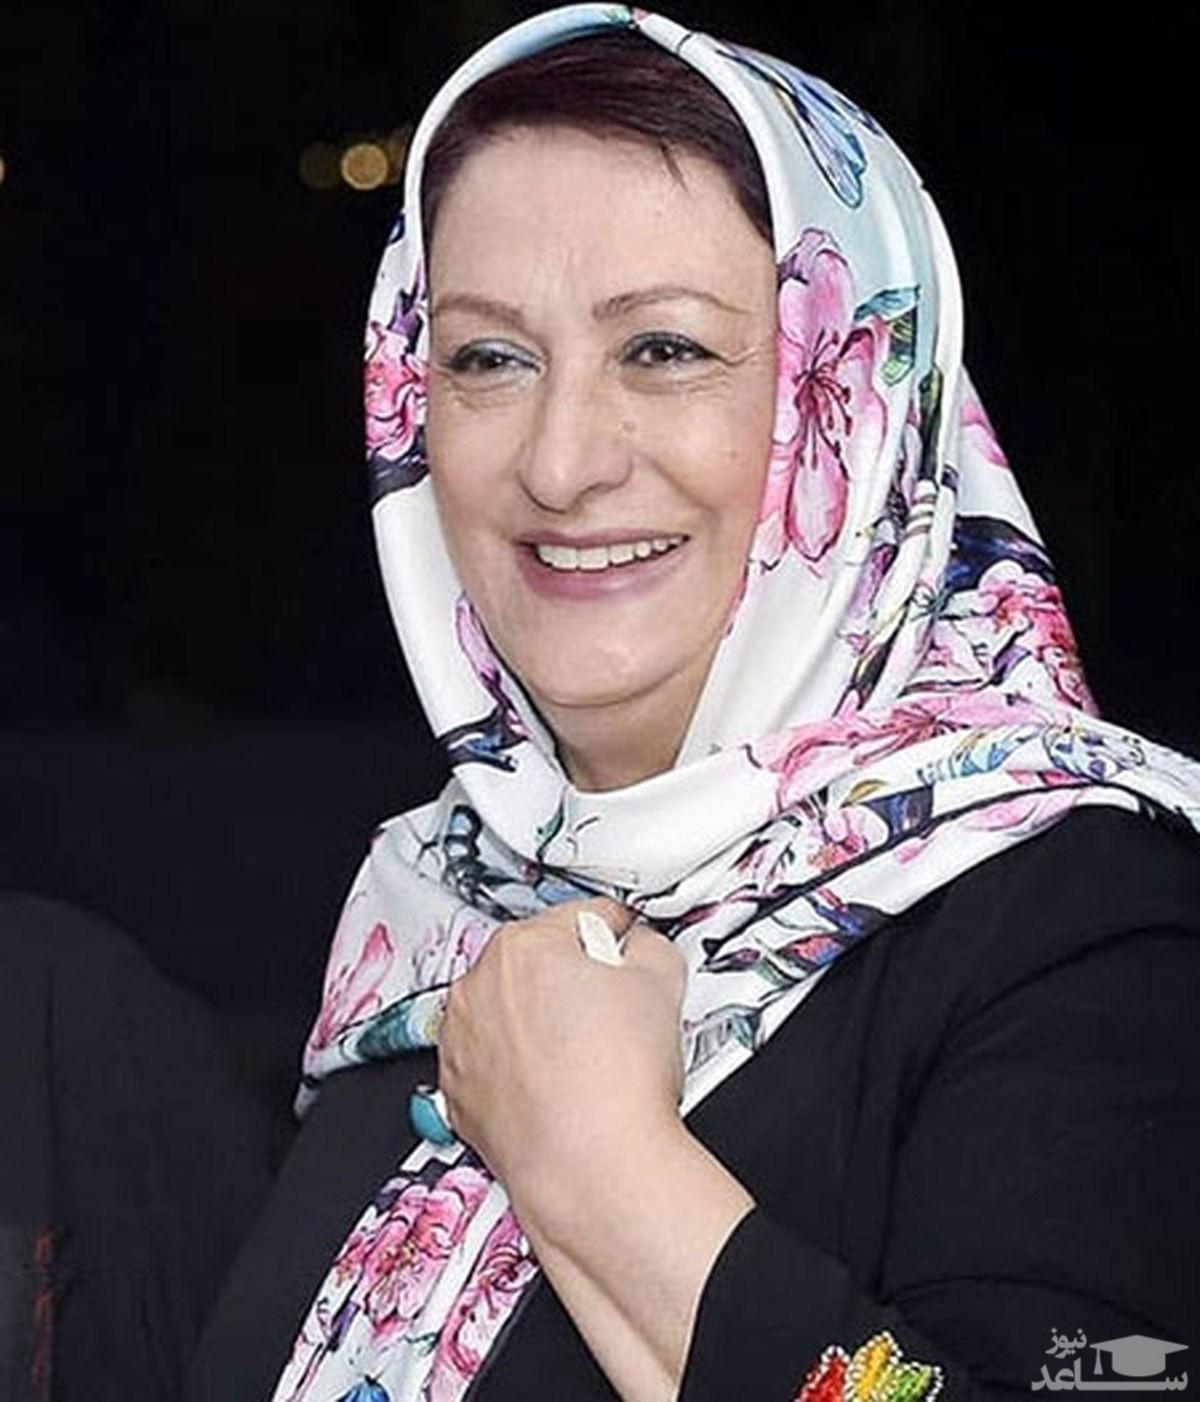 میهمانان ویژه مریم امیرجلالی